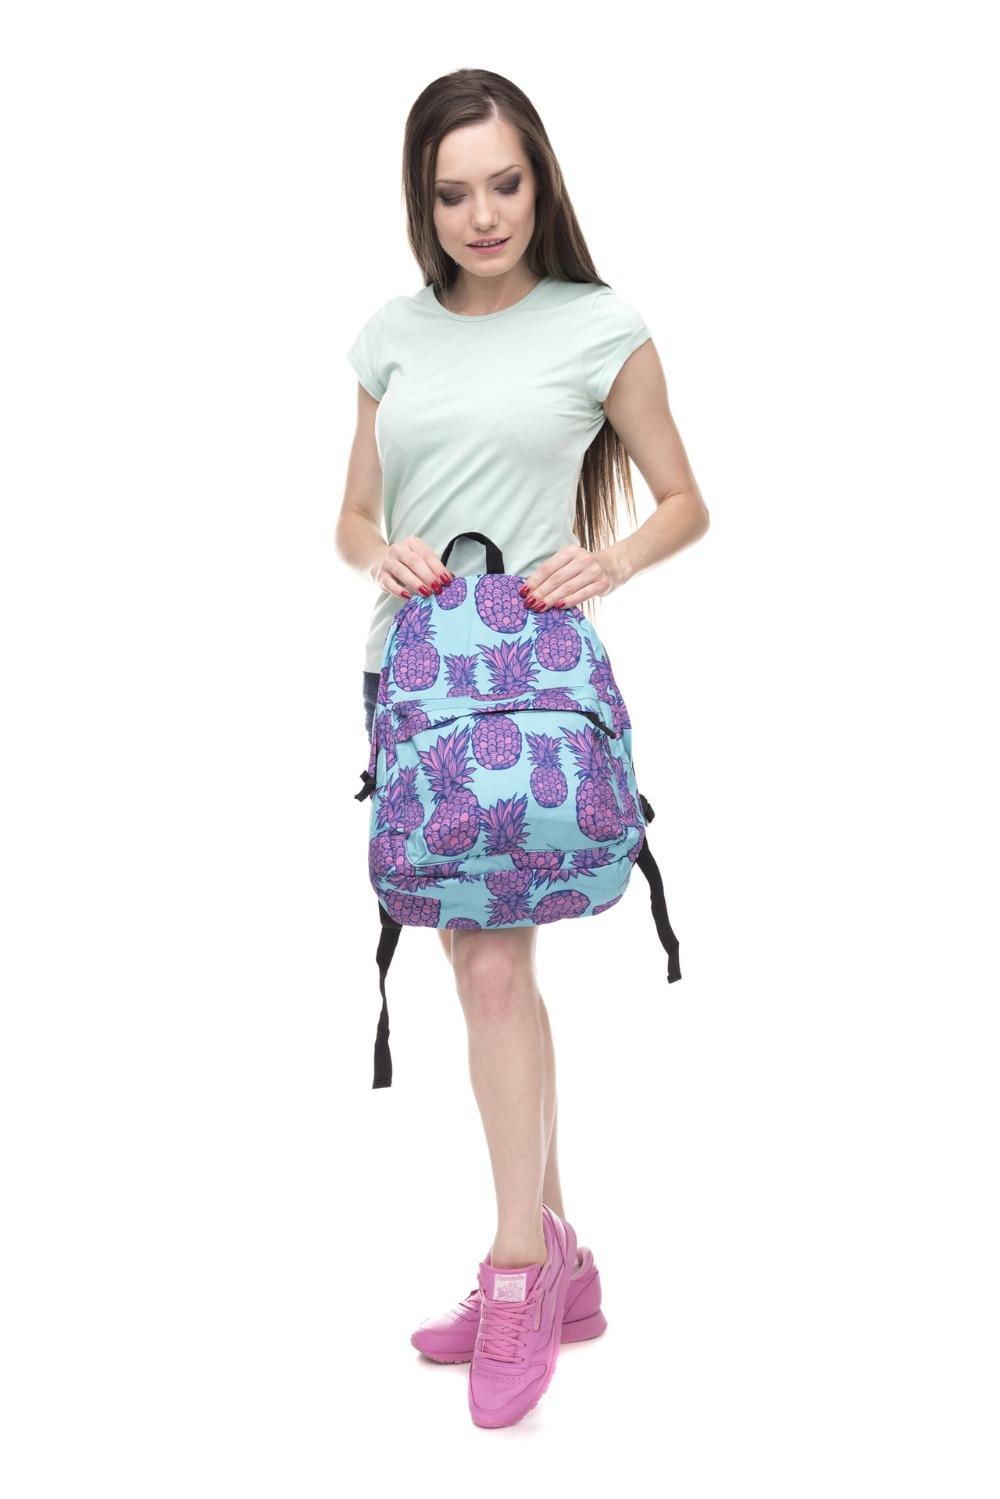 mochilas moda mochila para mulheres Estilo : Women's Backpack